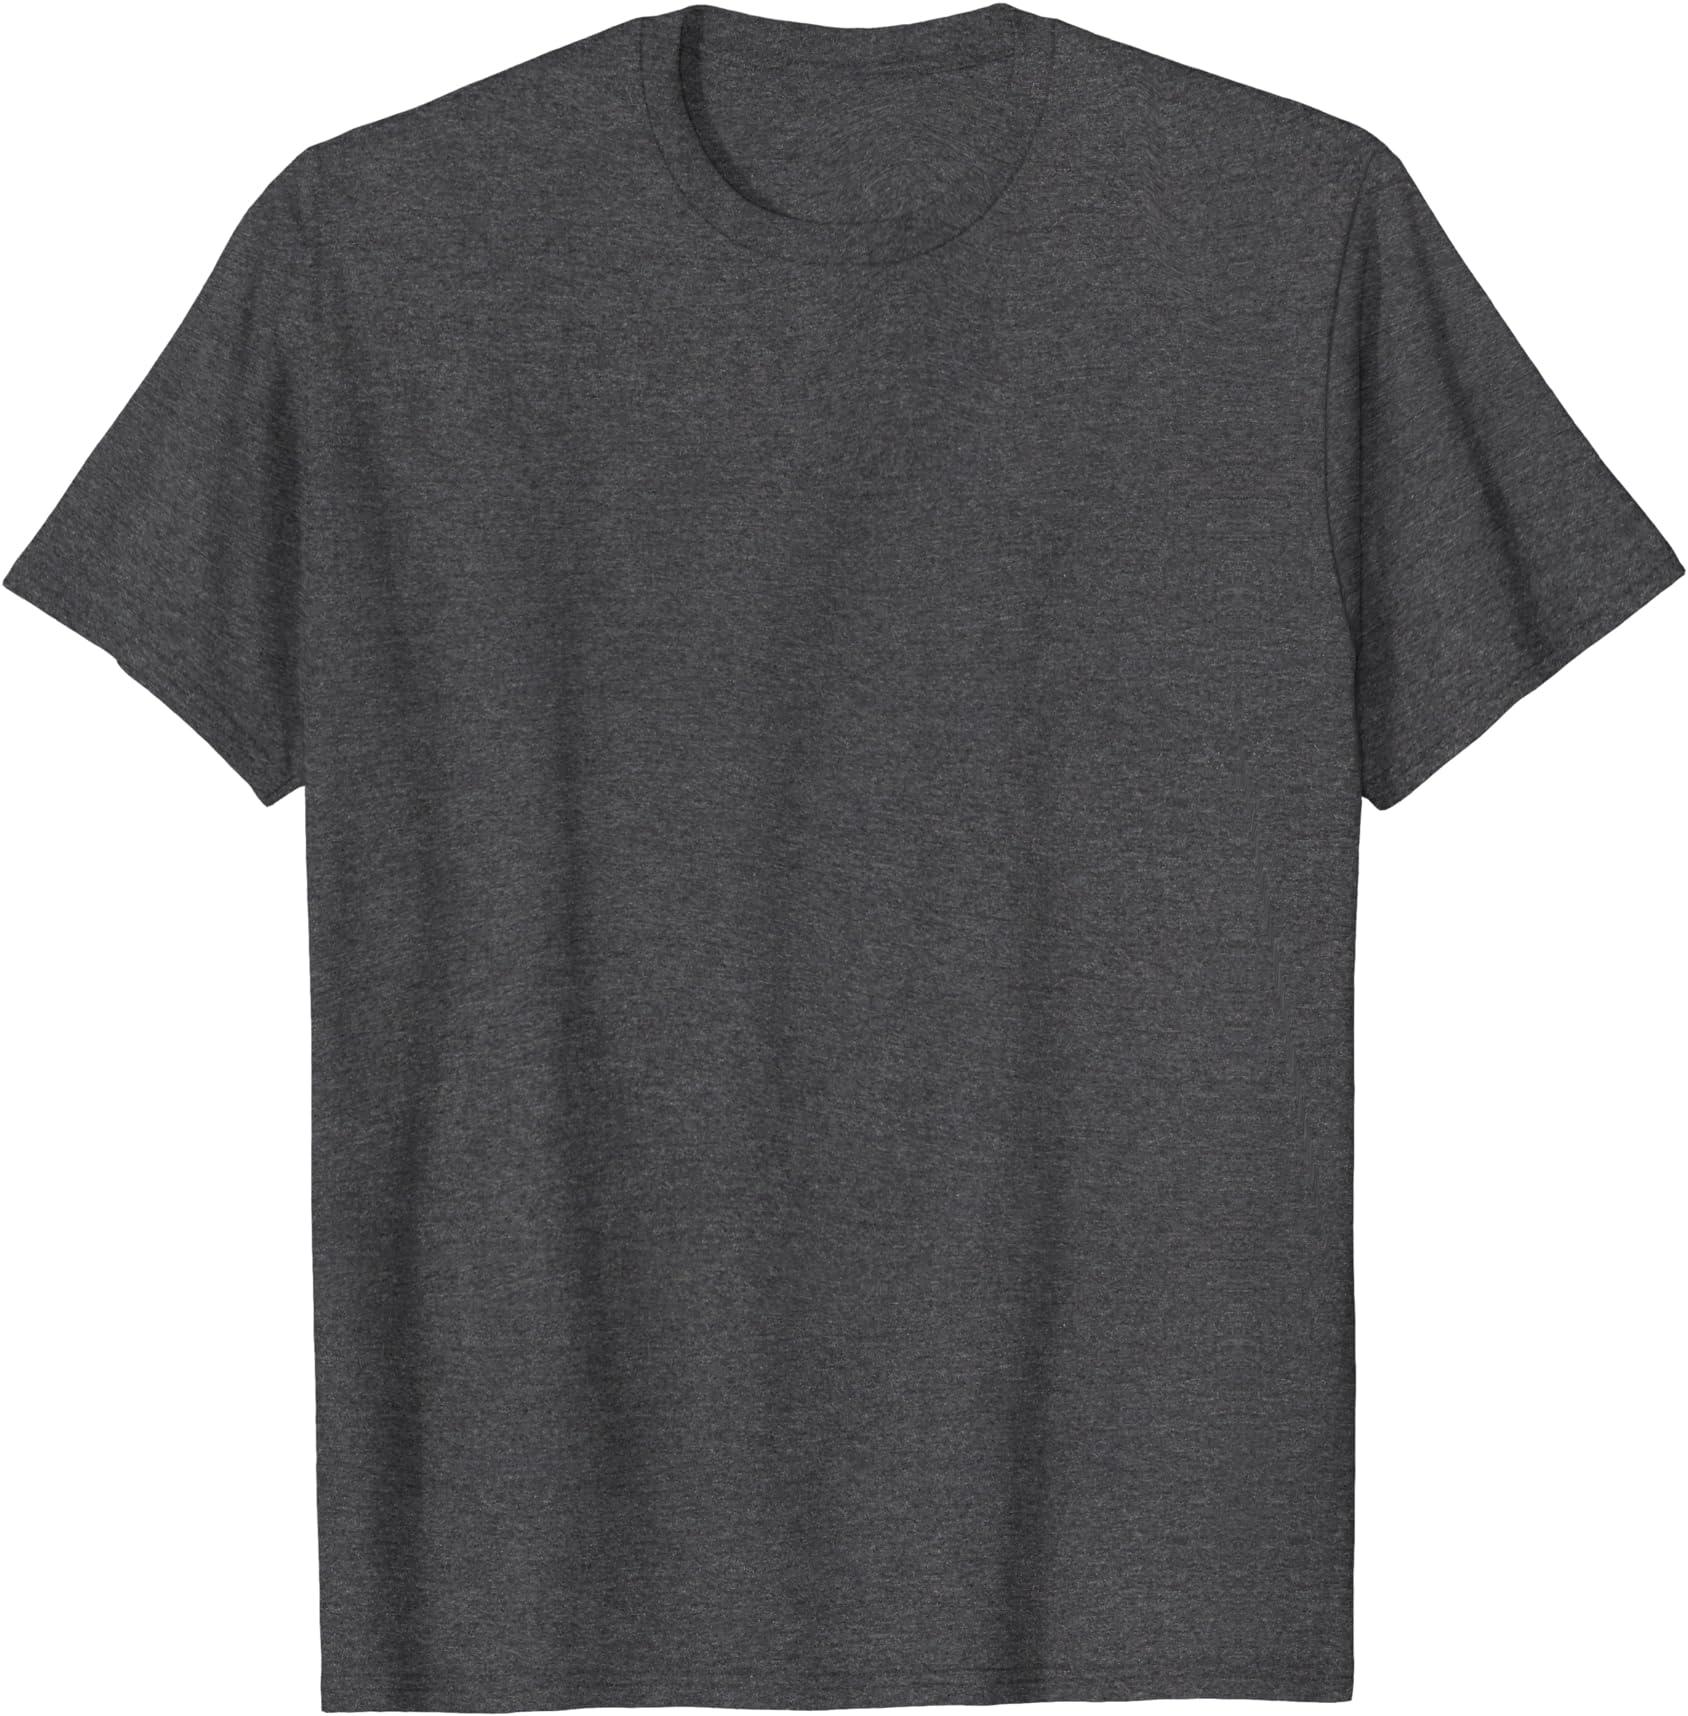 New TANKARD Thrash Metal Band Logo Men/'s Black T-Shirt Size S-3XL